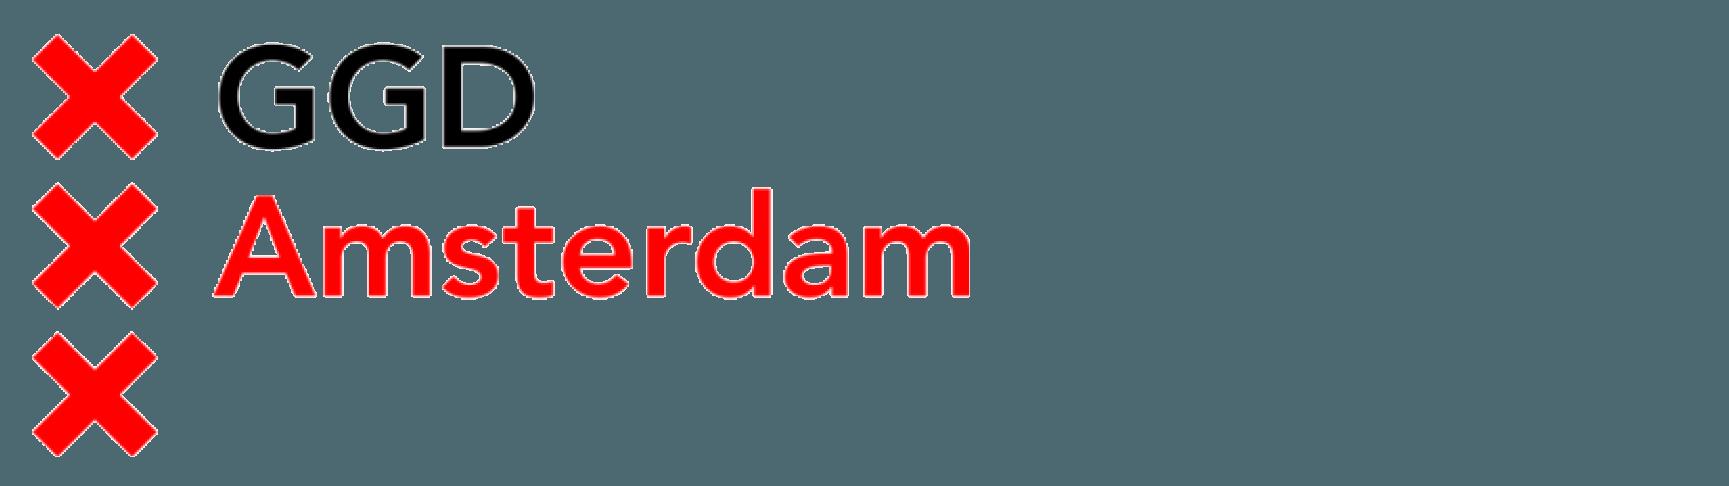 GGD Inspectierapport Amsterdam